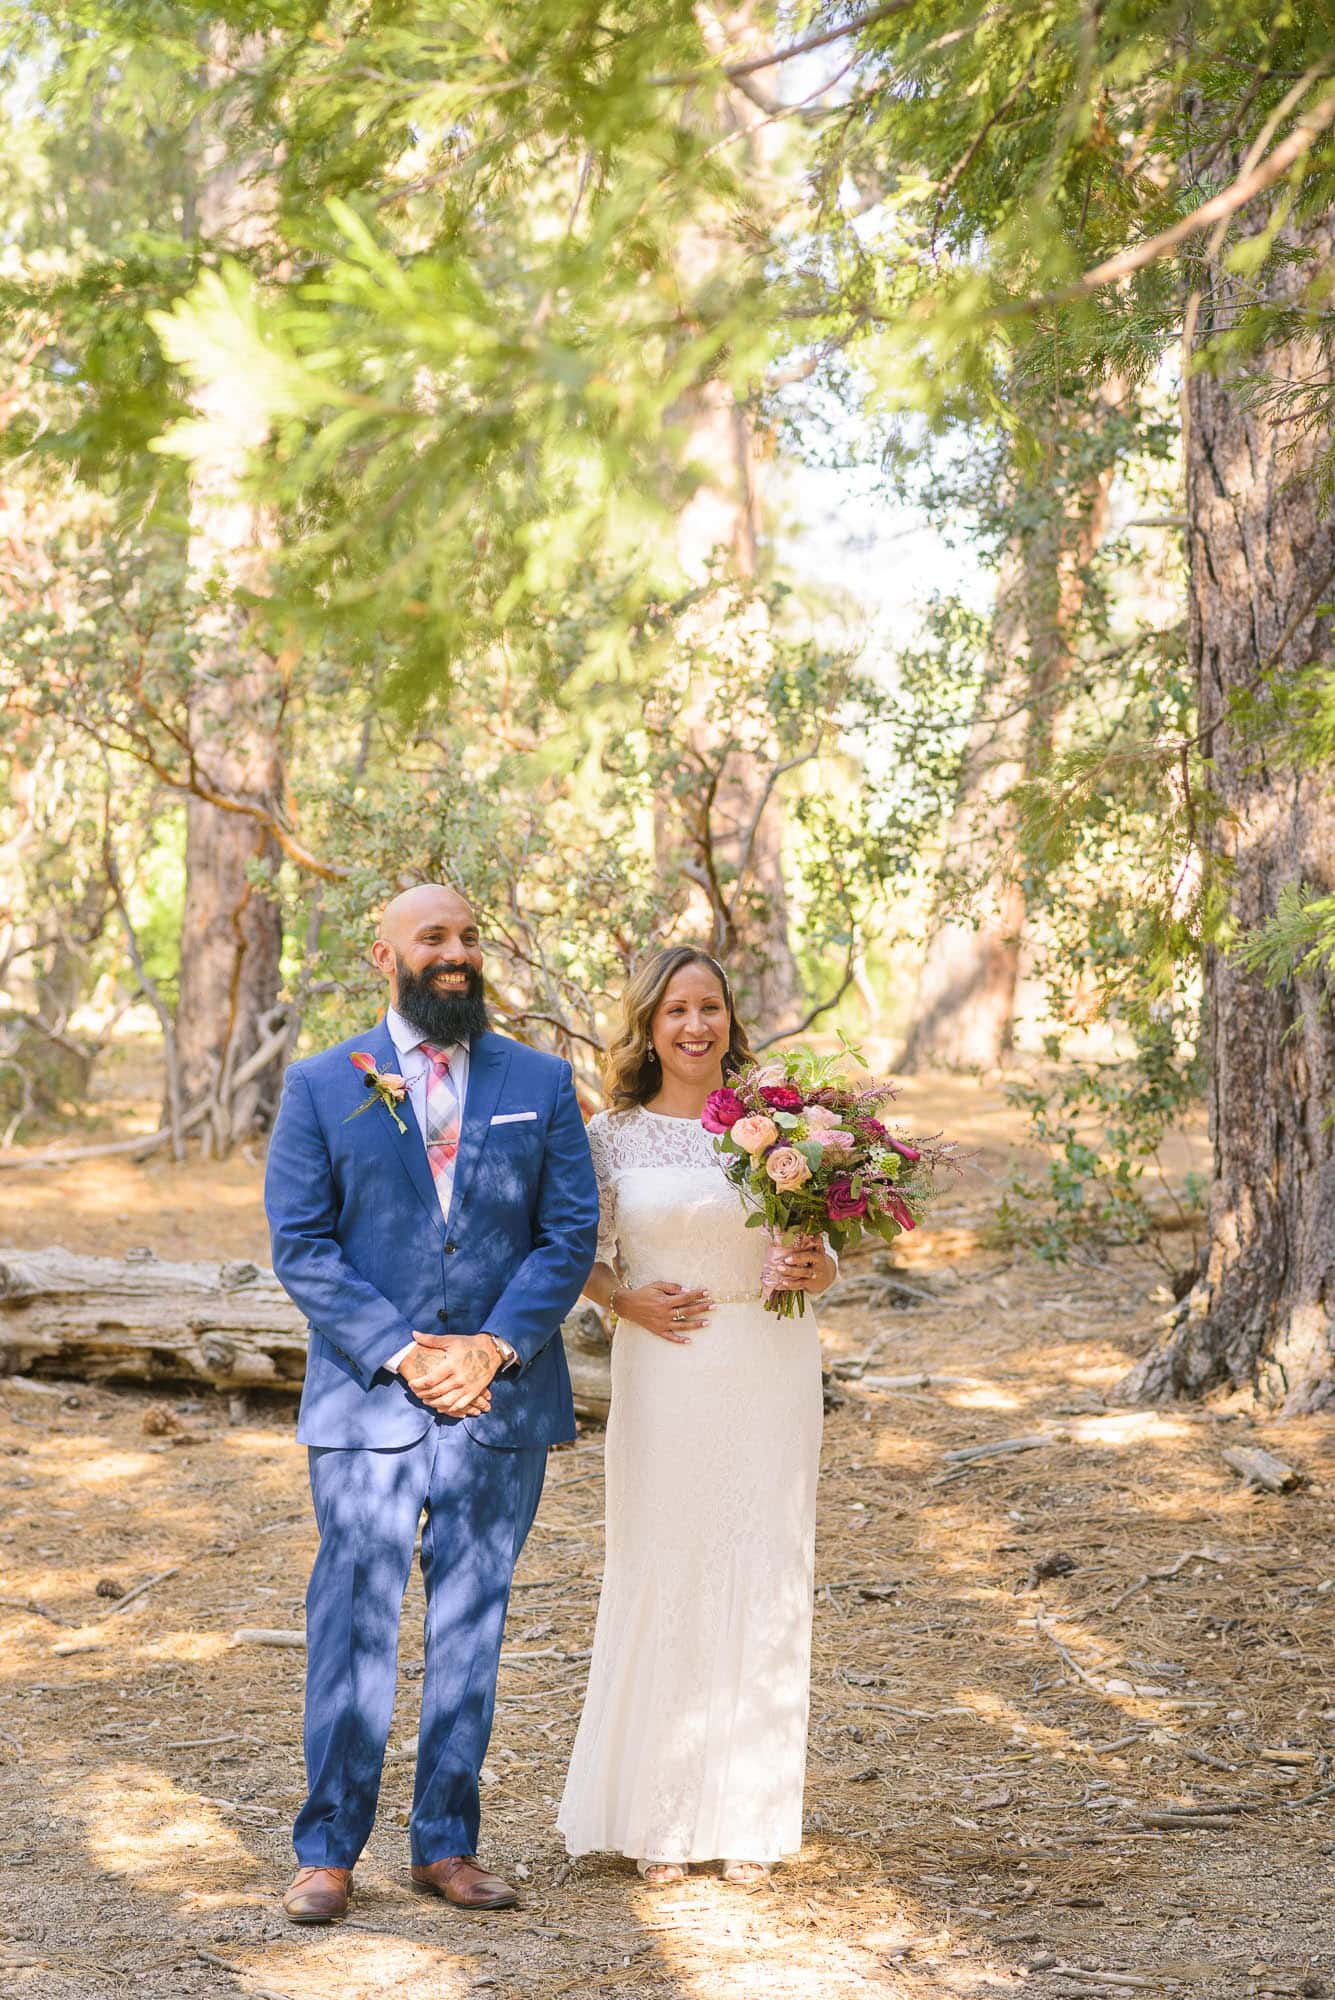 009_Alan_and_Heidi_Wedding_Jackie_Dannon